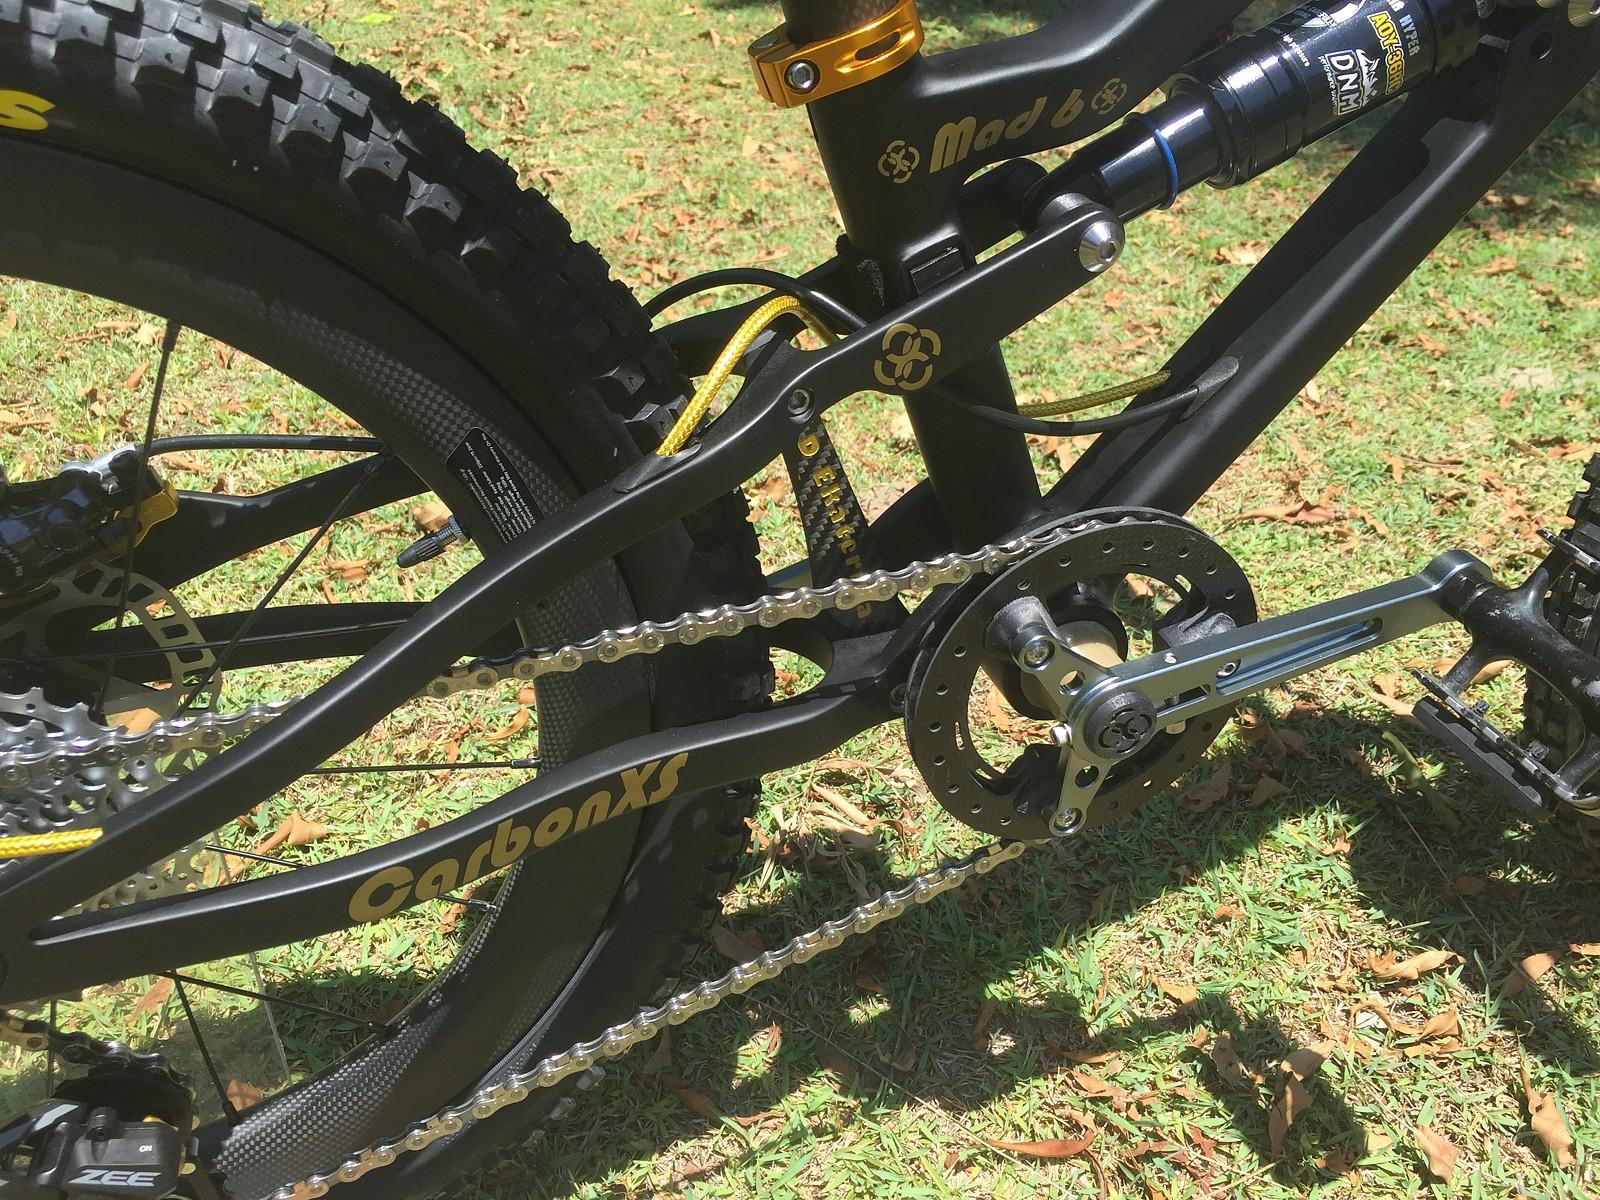 IMG 4188 - CarbonXScycles - Mountain Biking Pictures - Vital MTB